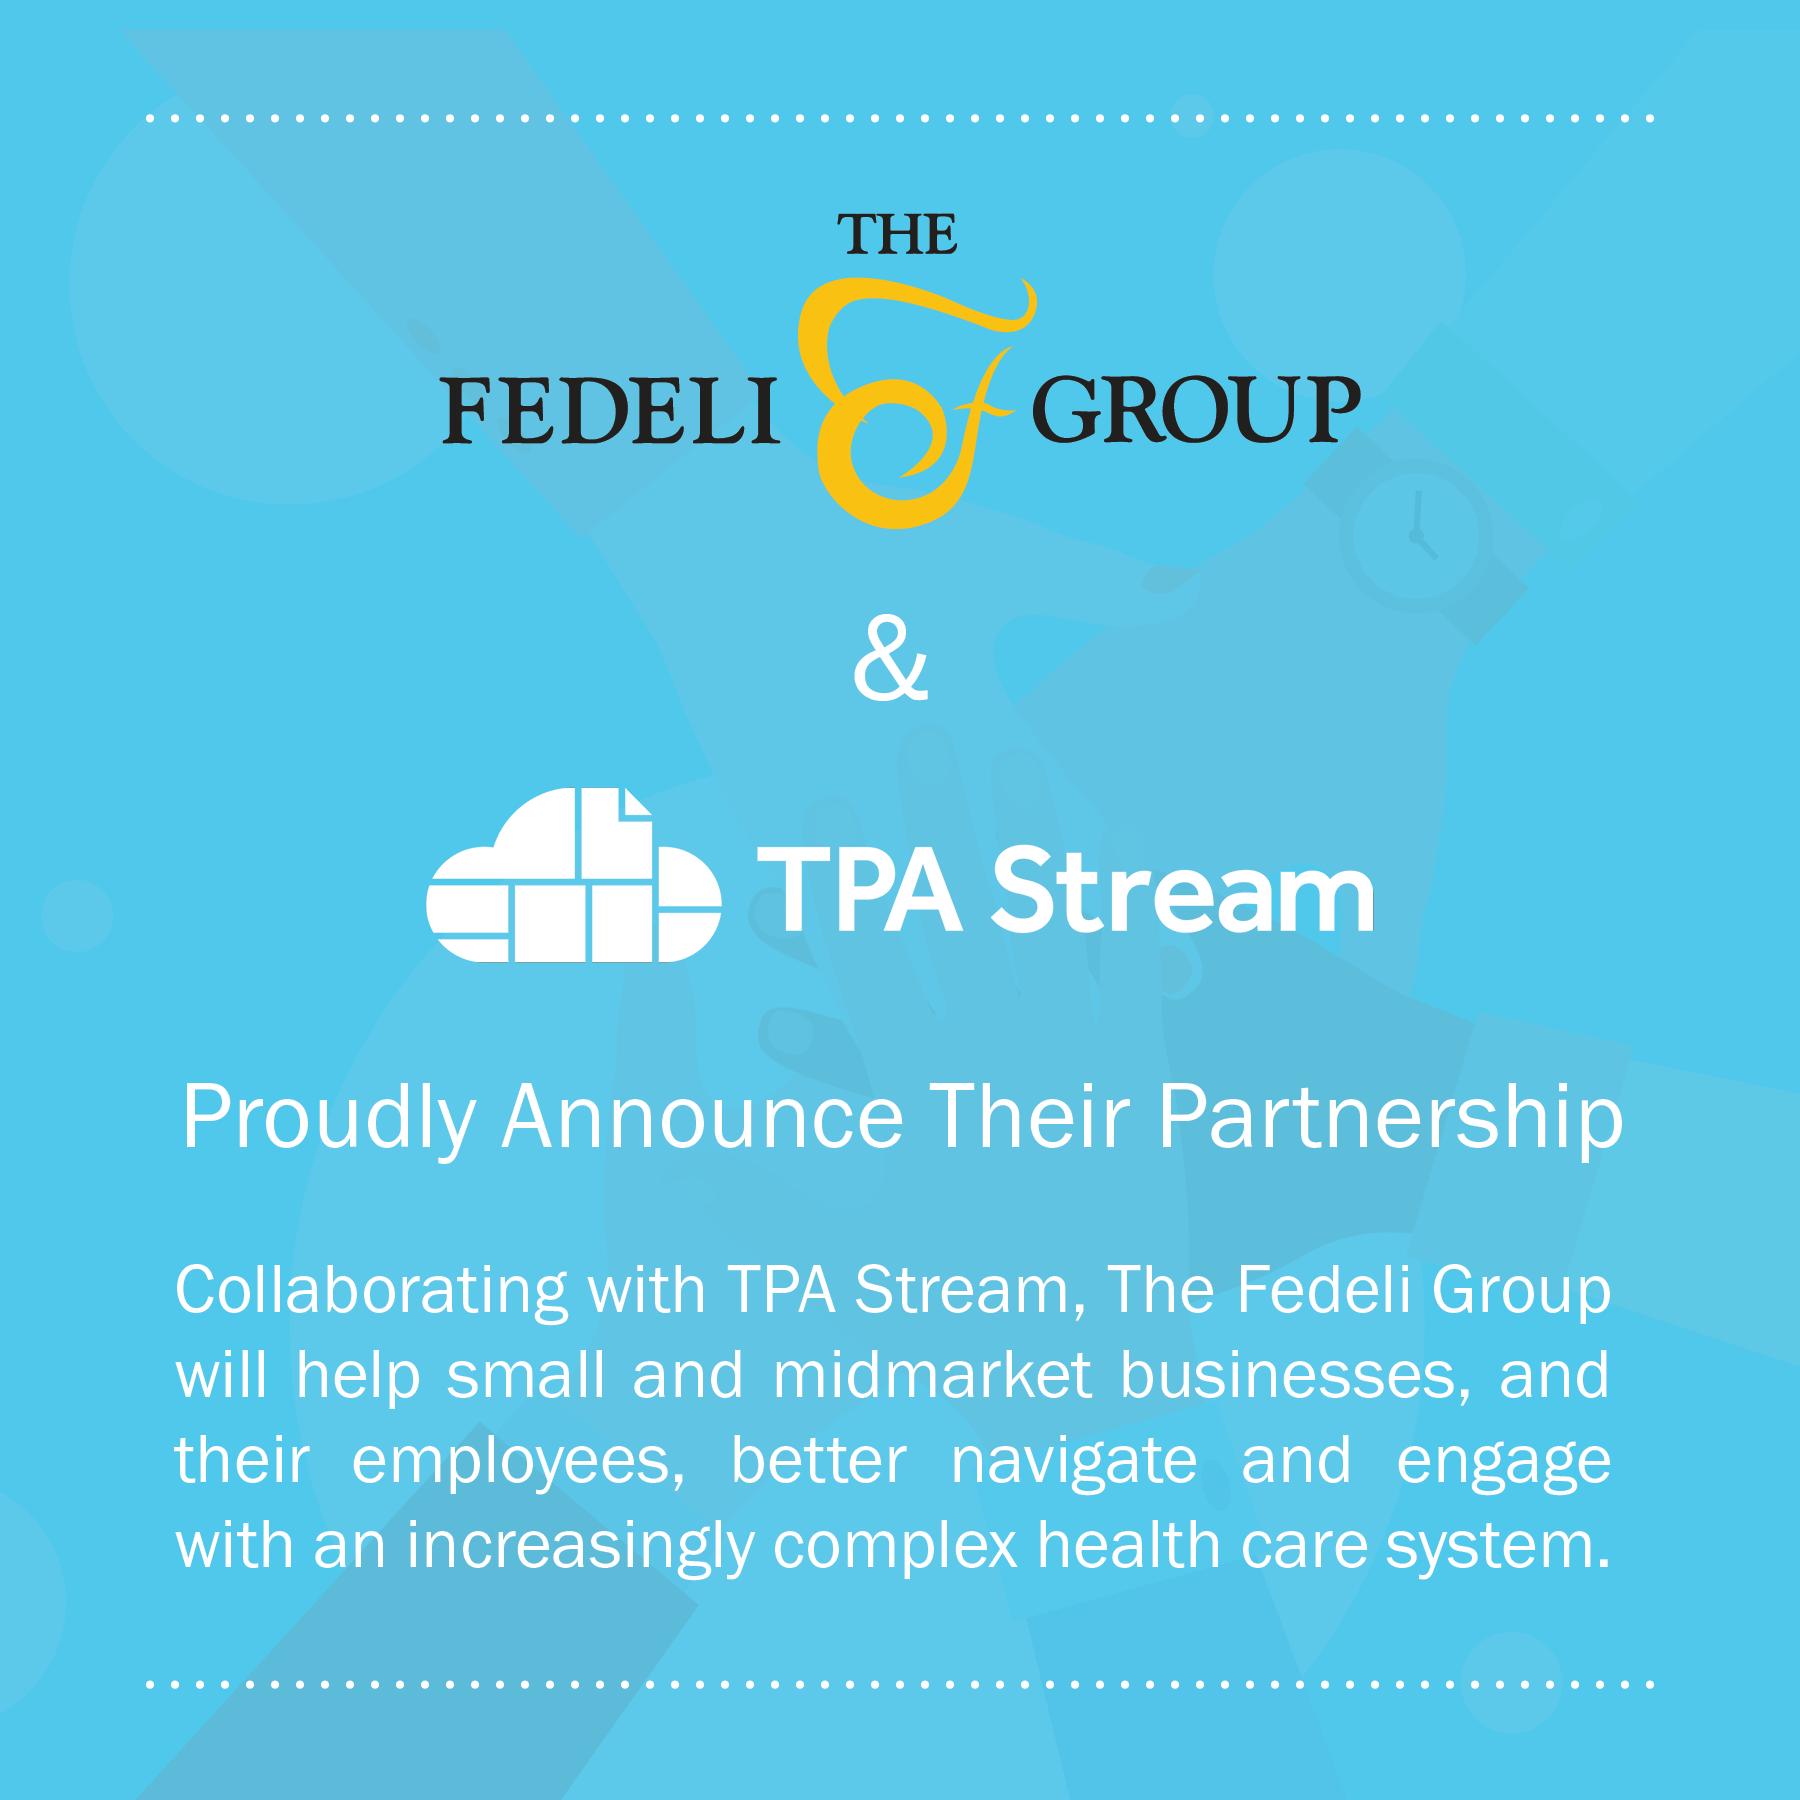 Fedeli And TPA Stream Announcement Graphic 1